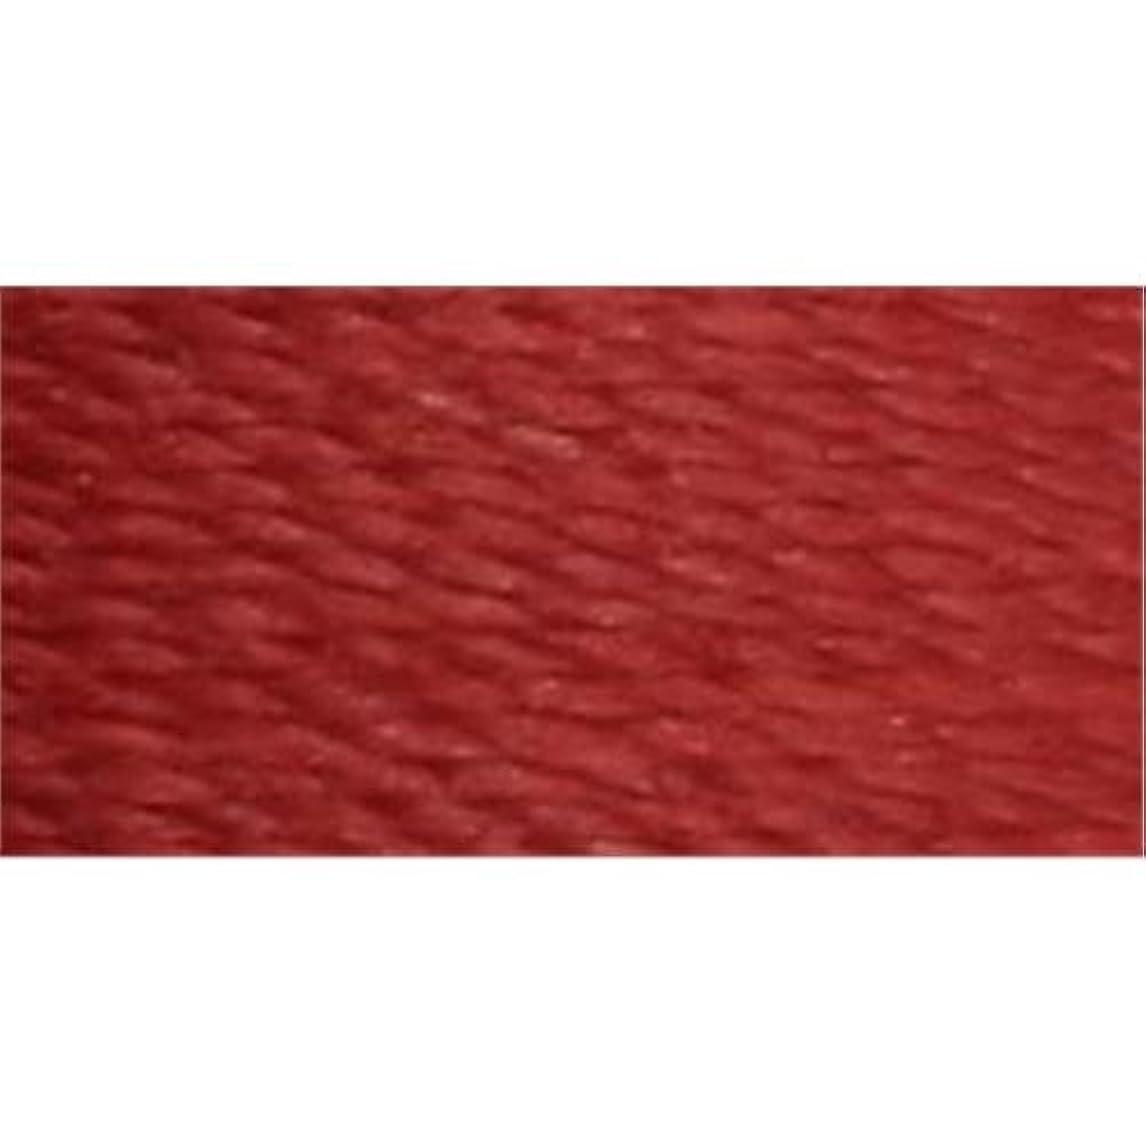 Dual Duty Plus Button Thread 50yds - Red zrnmu20677930893